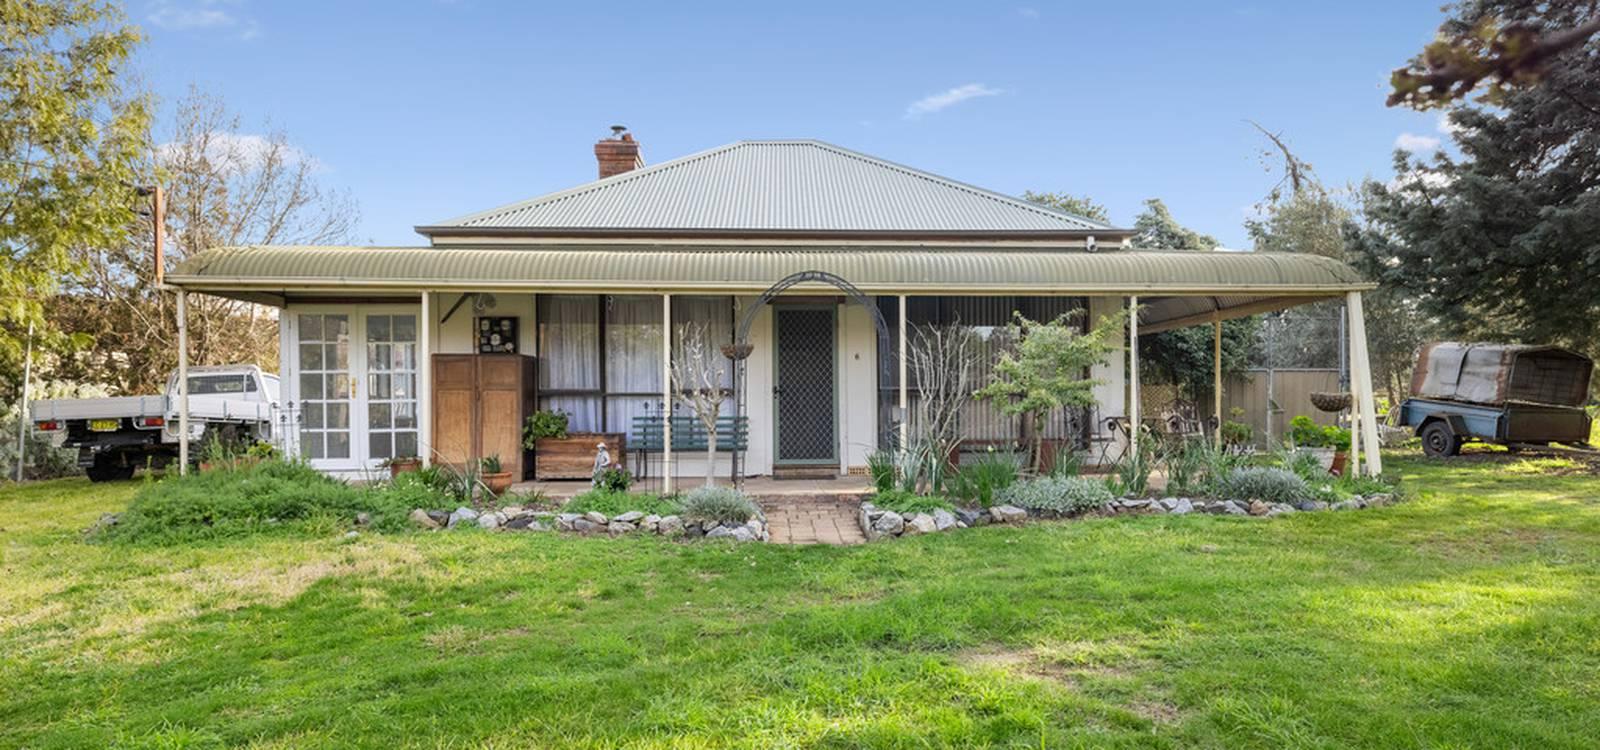 6 Railway St GALONG, NSW 2585 - photo 1